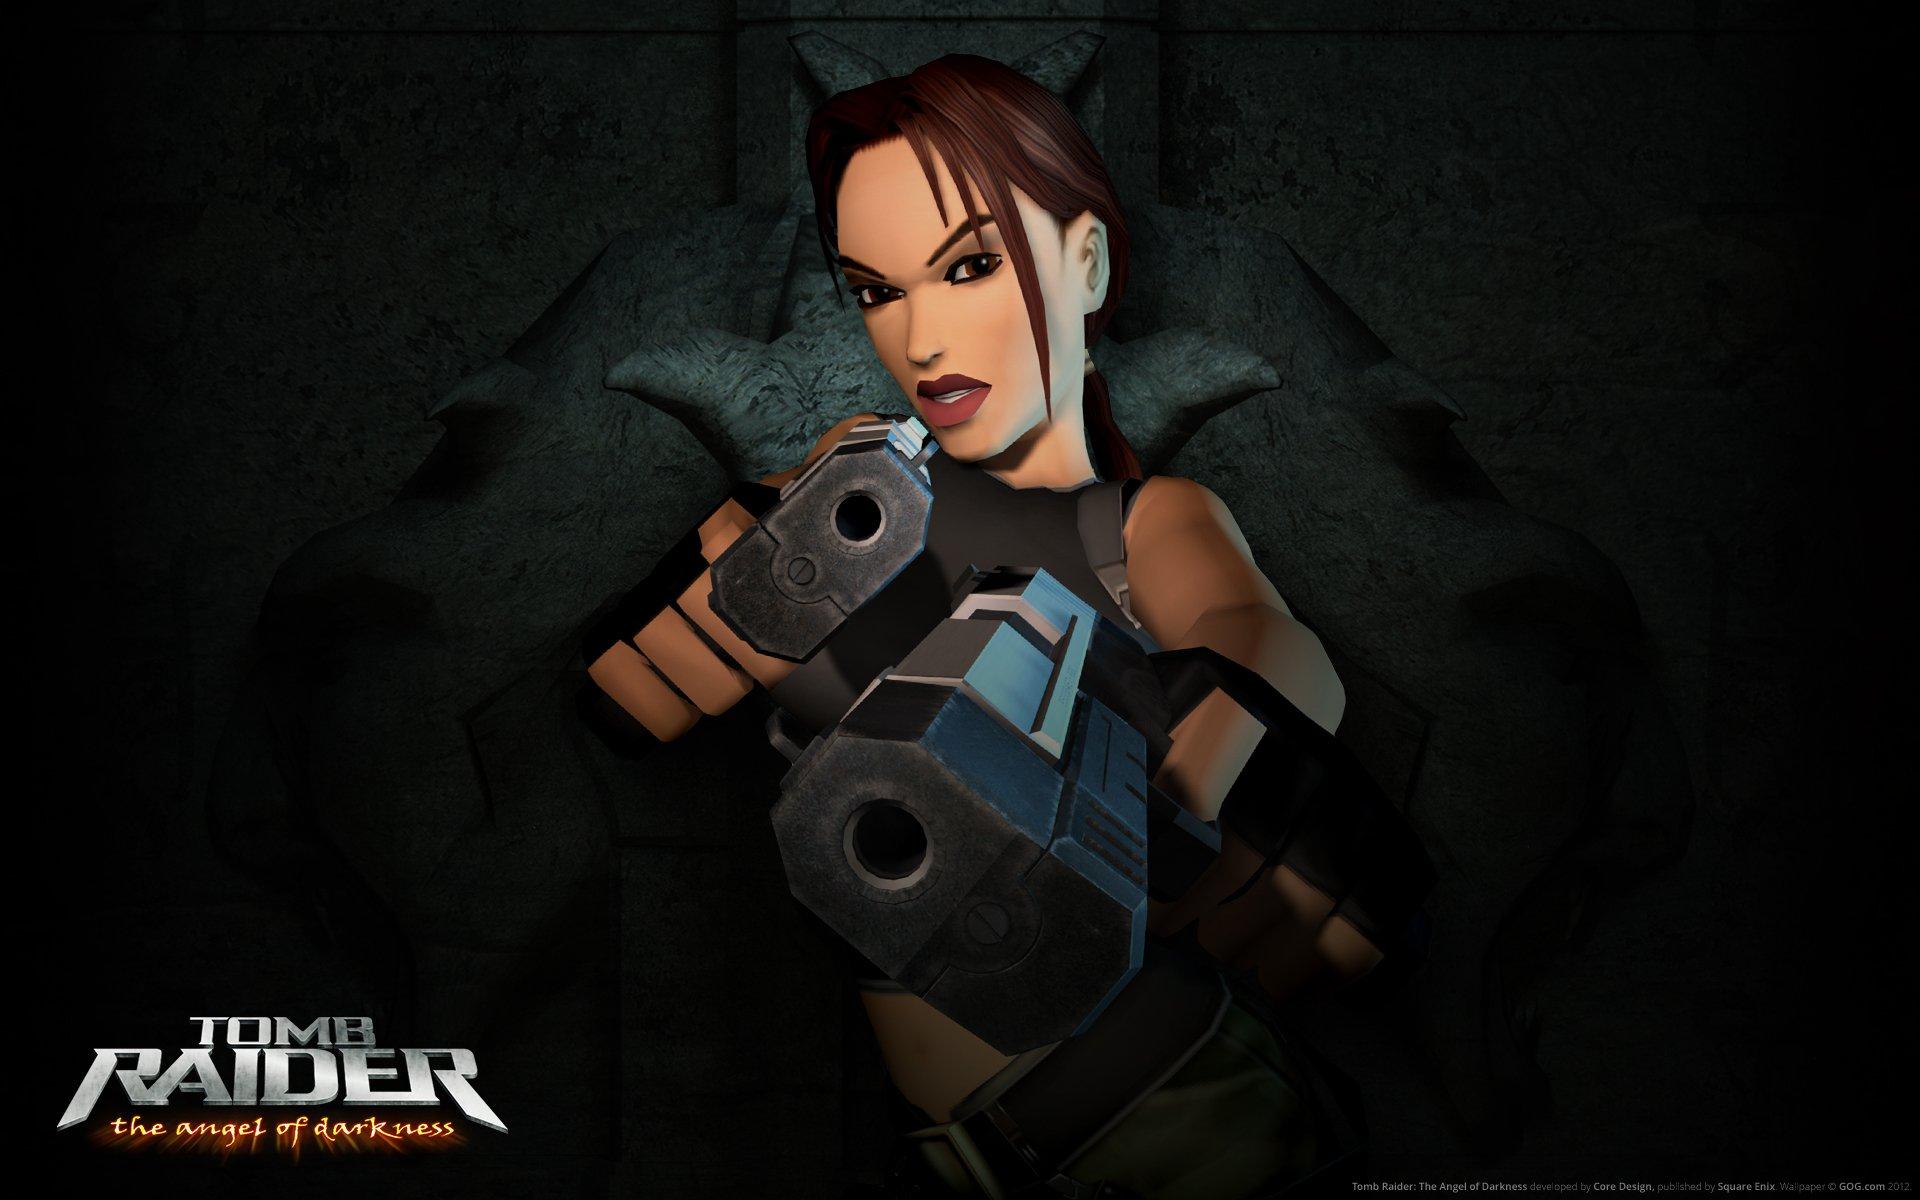 tomb_raider_10.jpg